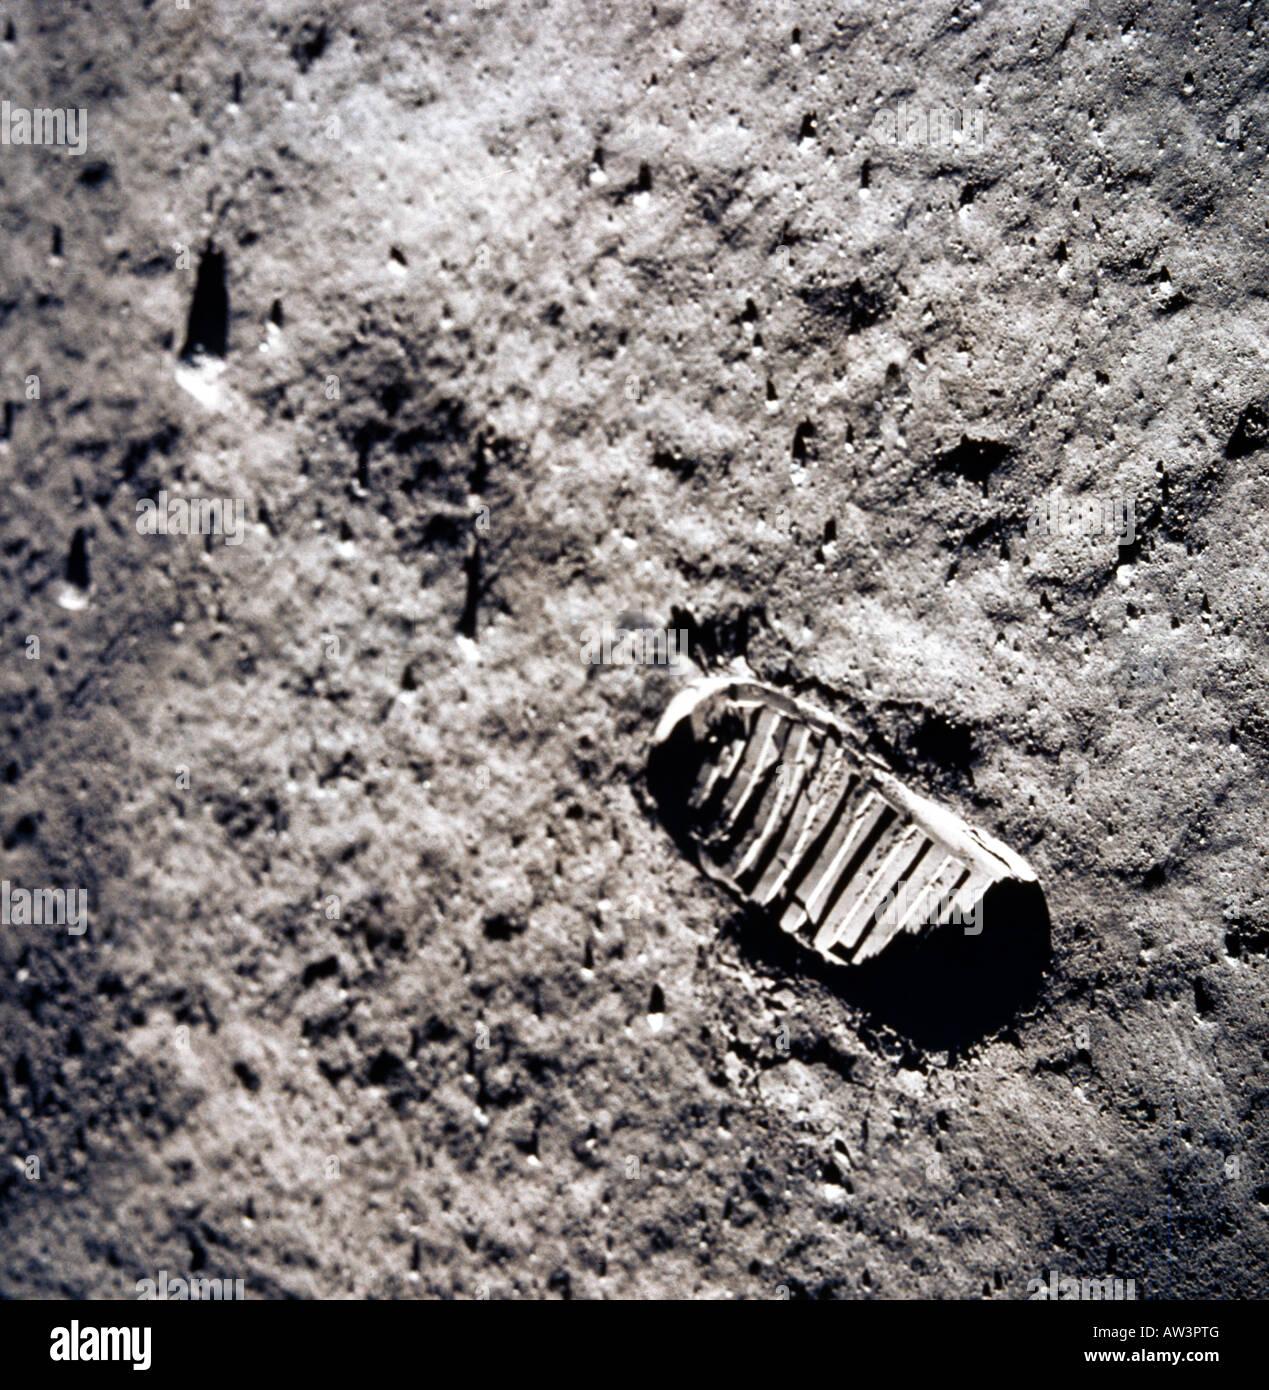 Fußabdruck auf dem Mond Stockbild